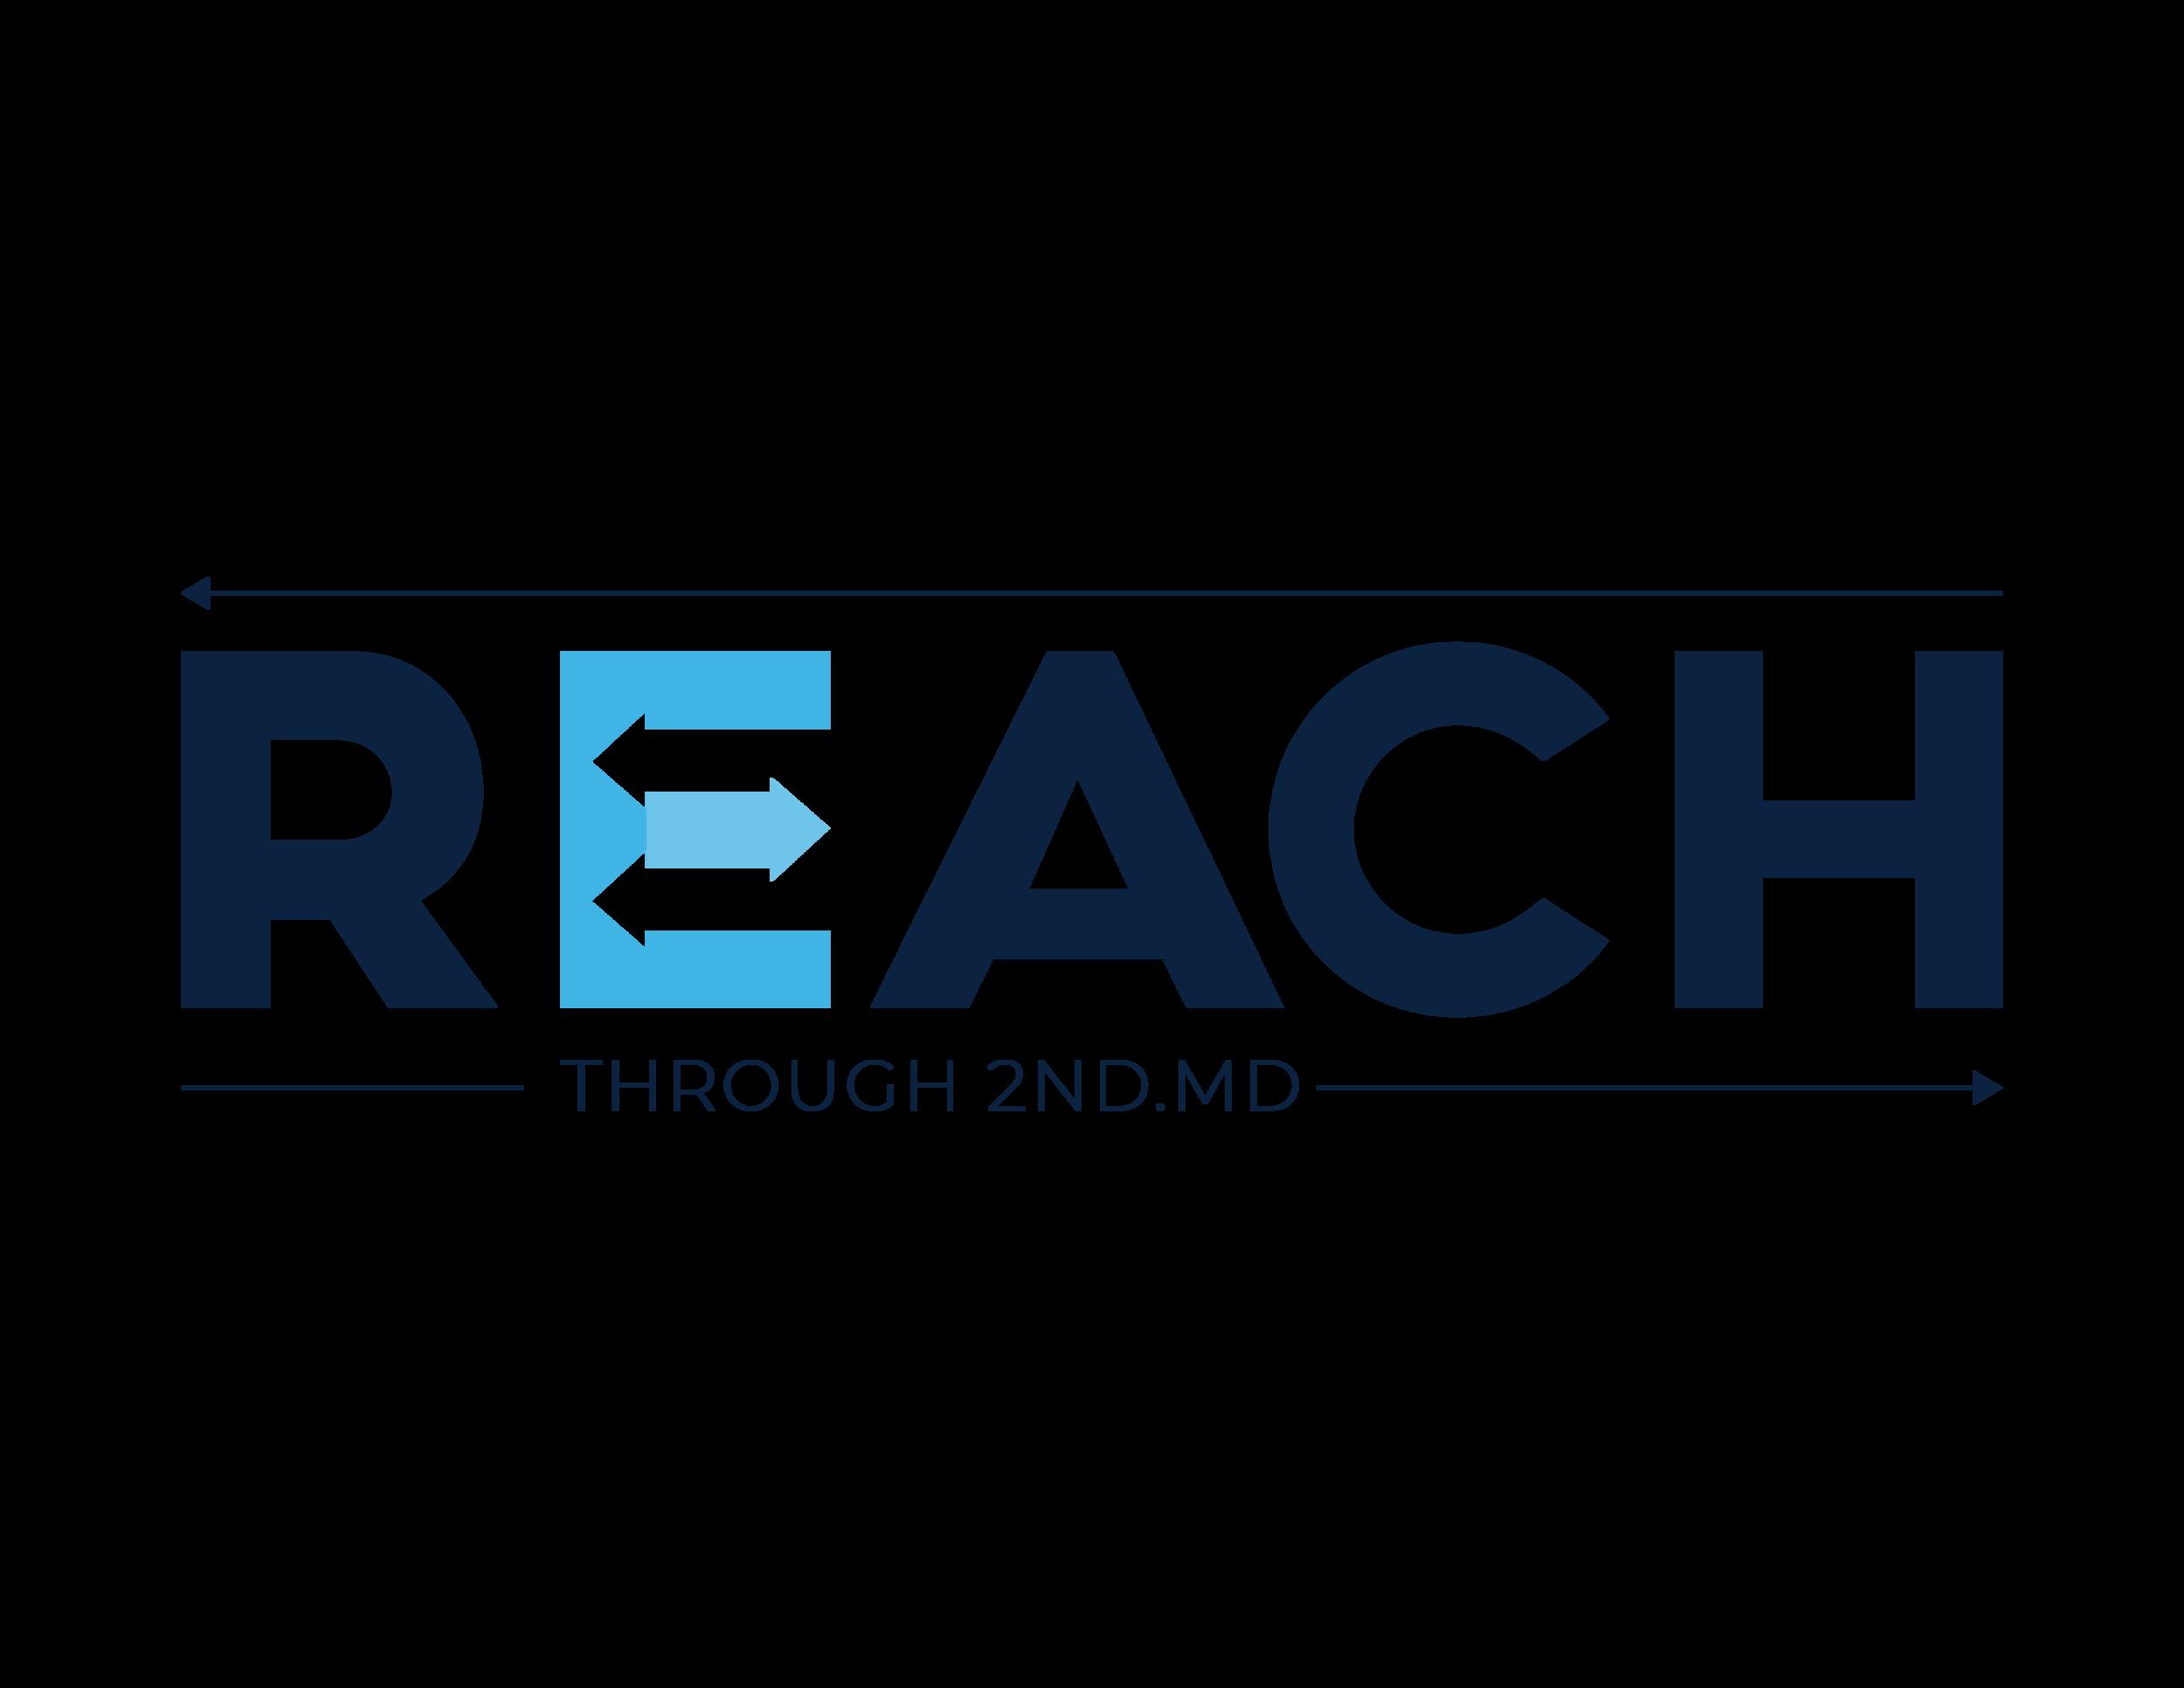 reach logo-01-01.png